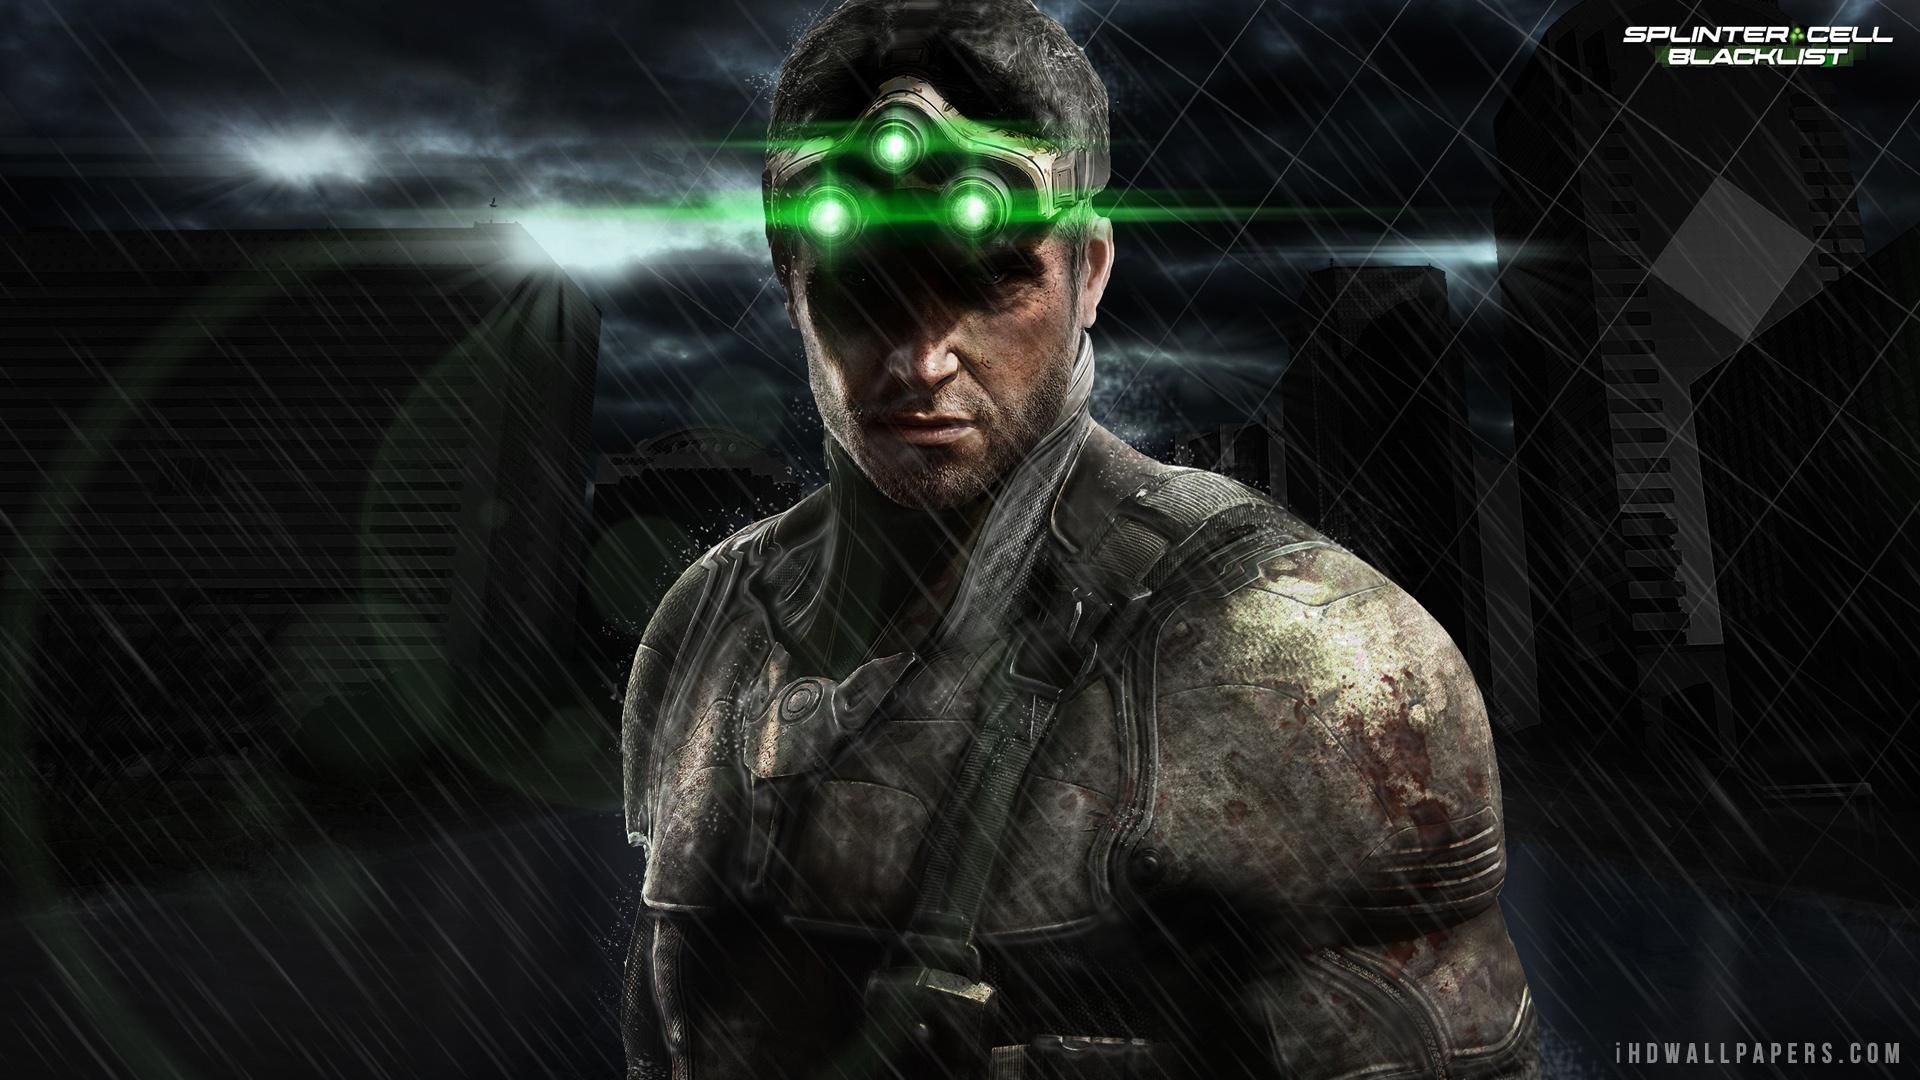 Tom Clancy Splinter Cell Blacklist 2013 HD Wallpaper   iHD Wallpapers 1920x1080